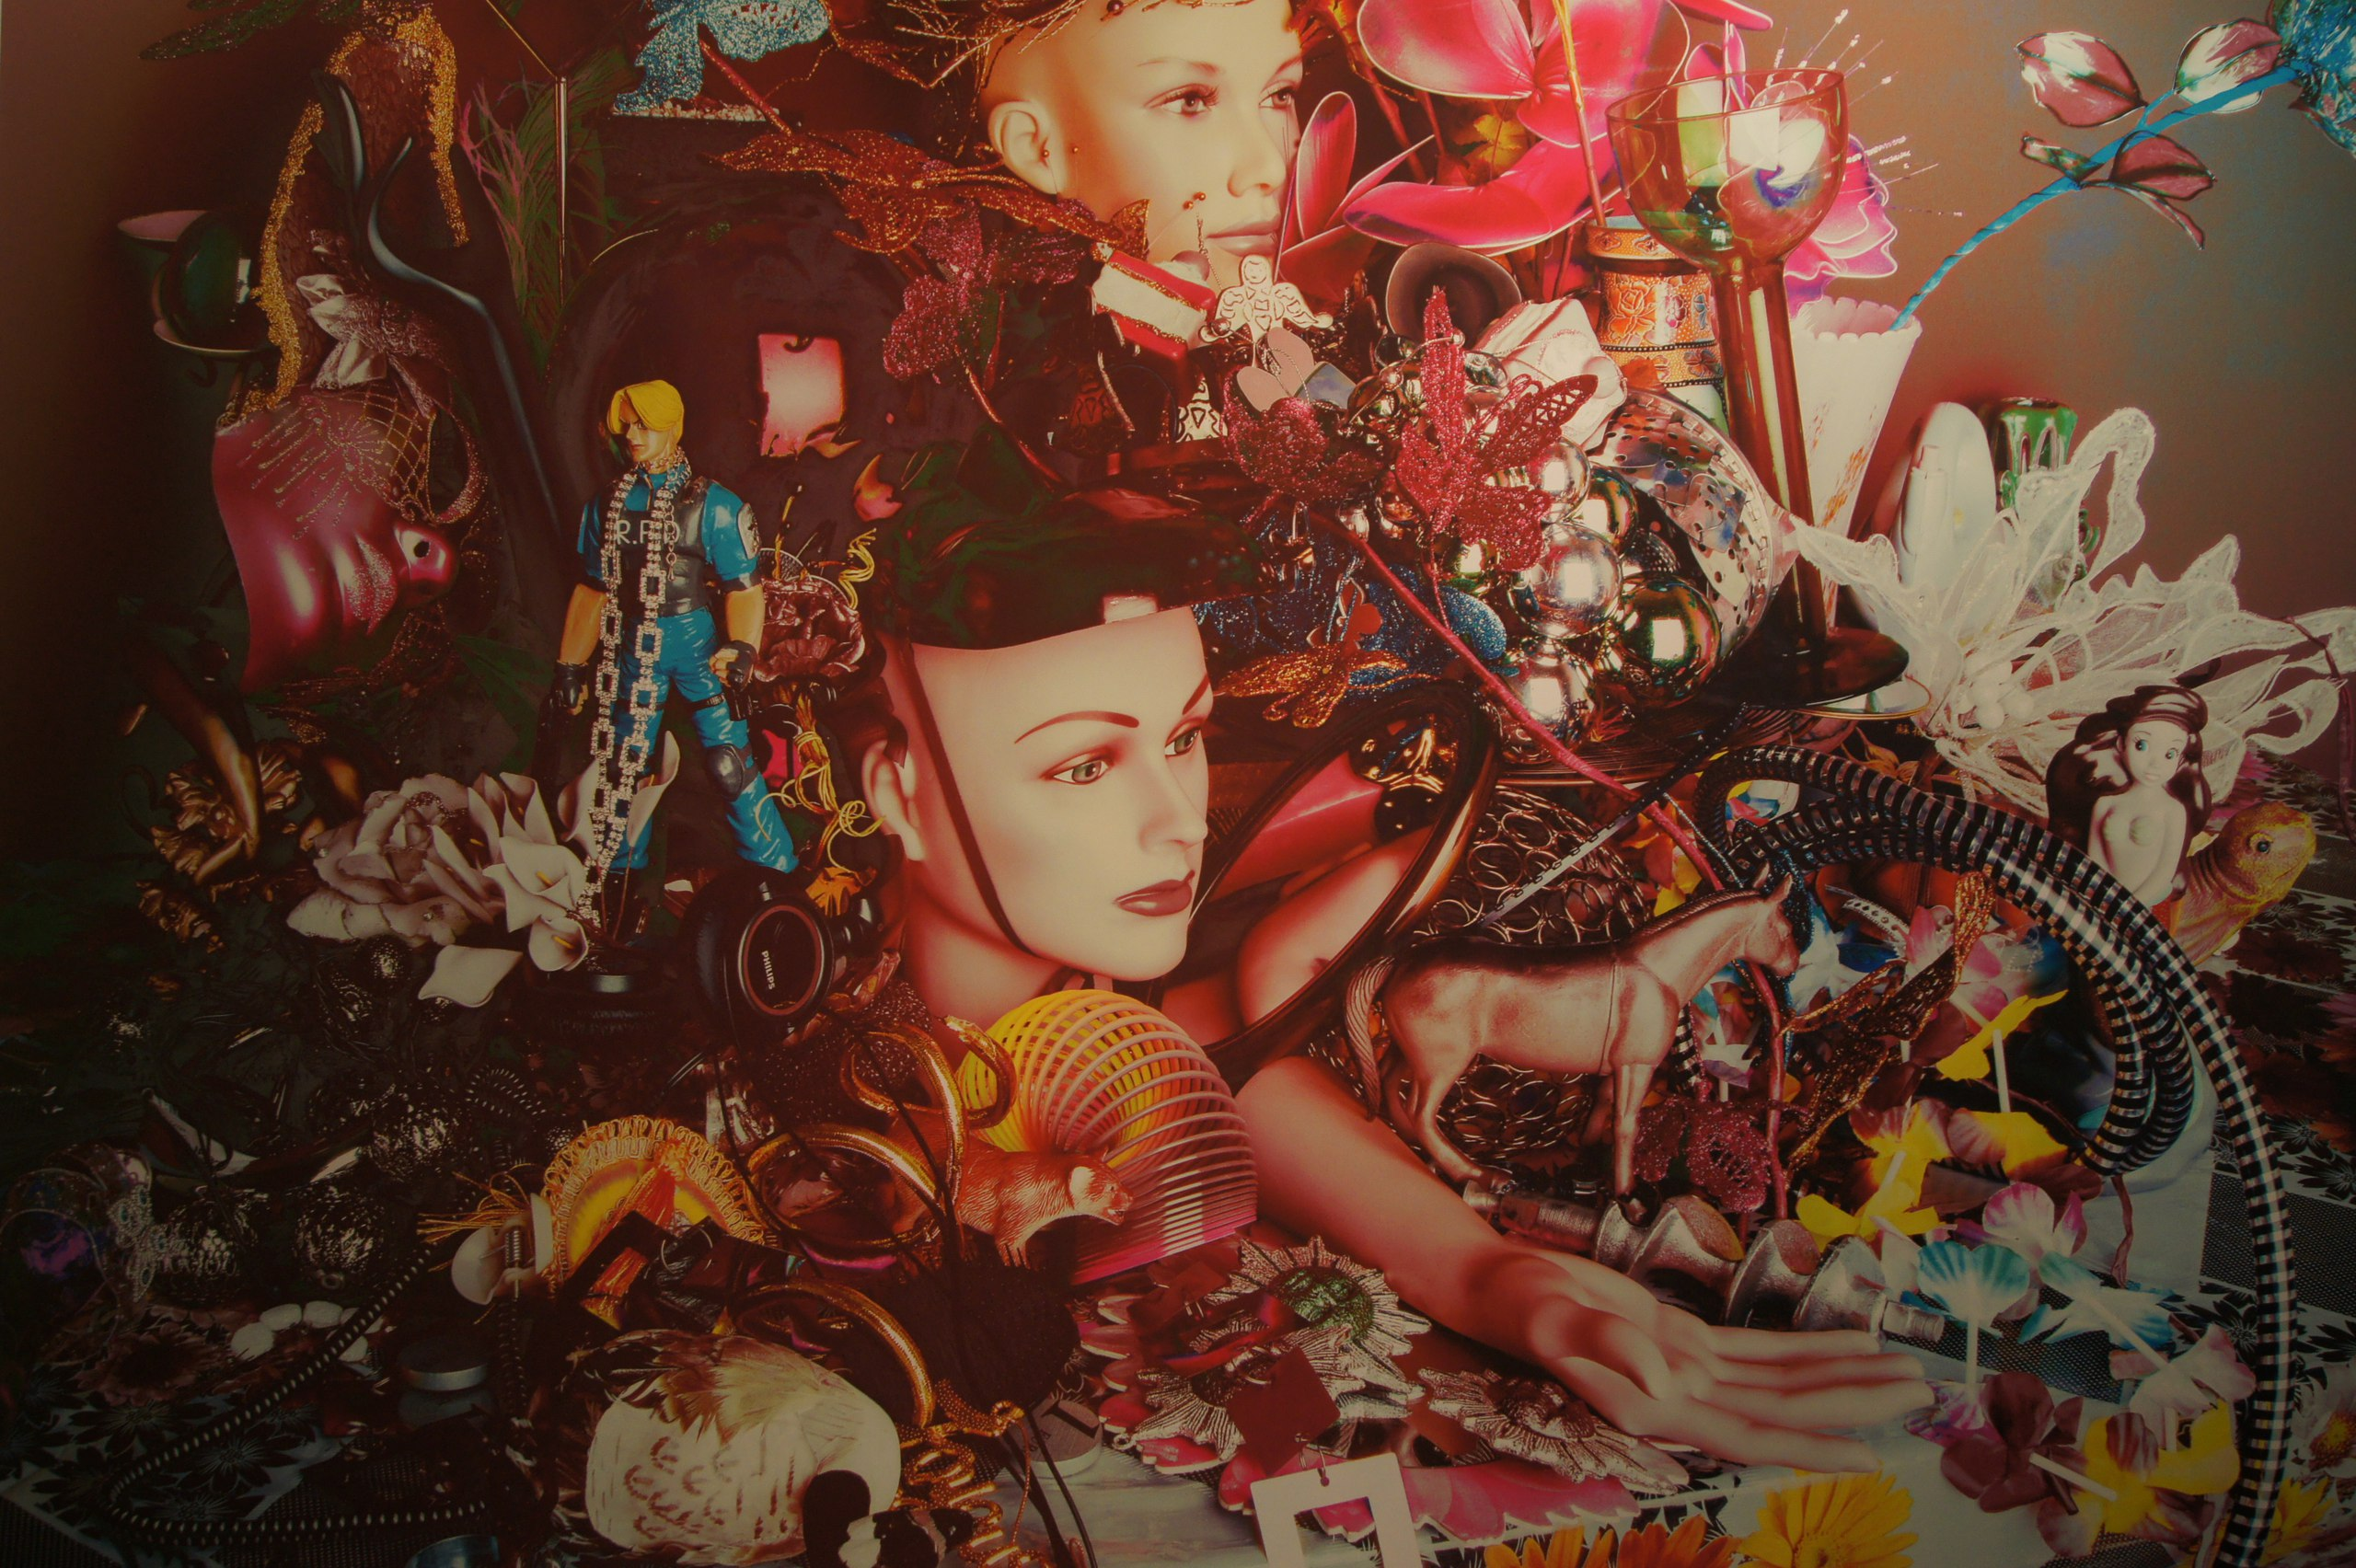 Валери Белен. Натюрморт с зеркалом. 2014. Из серии «Натюрморты» (2014)